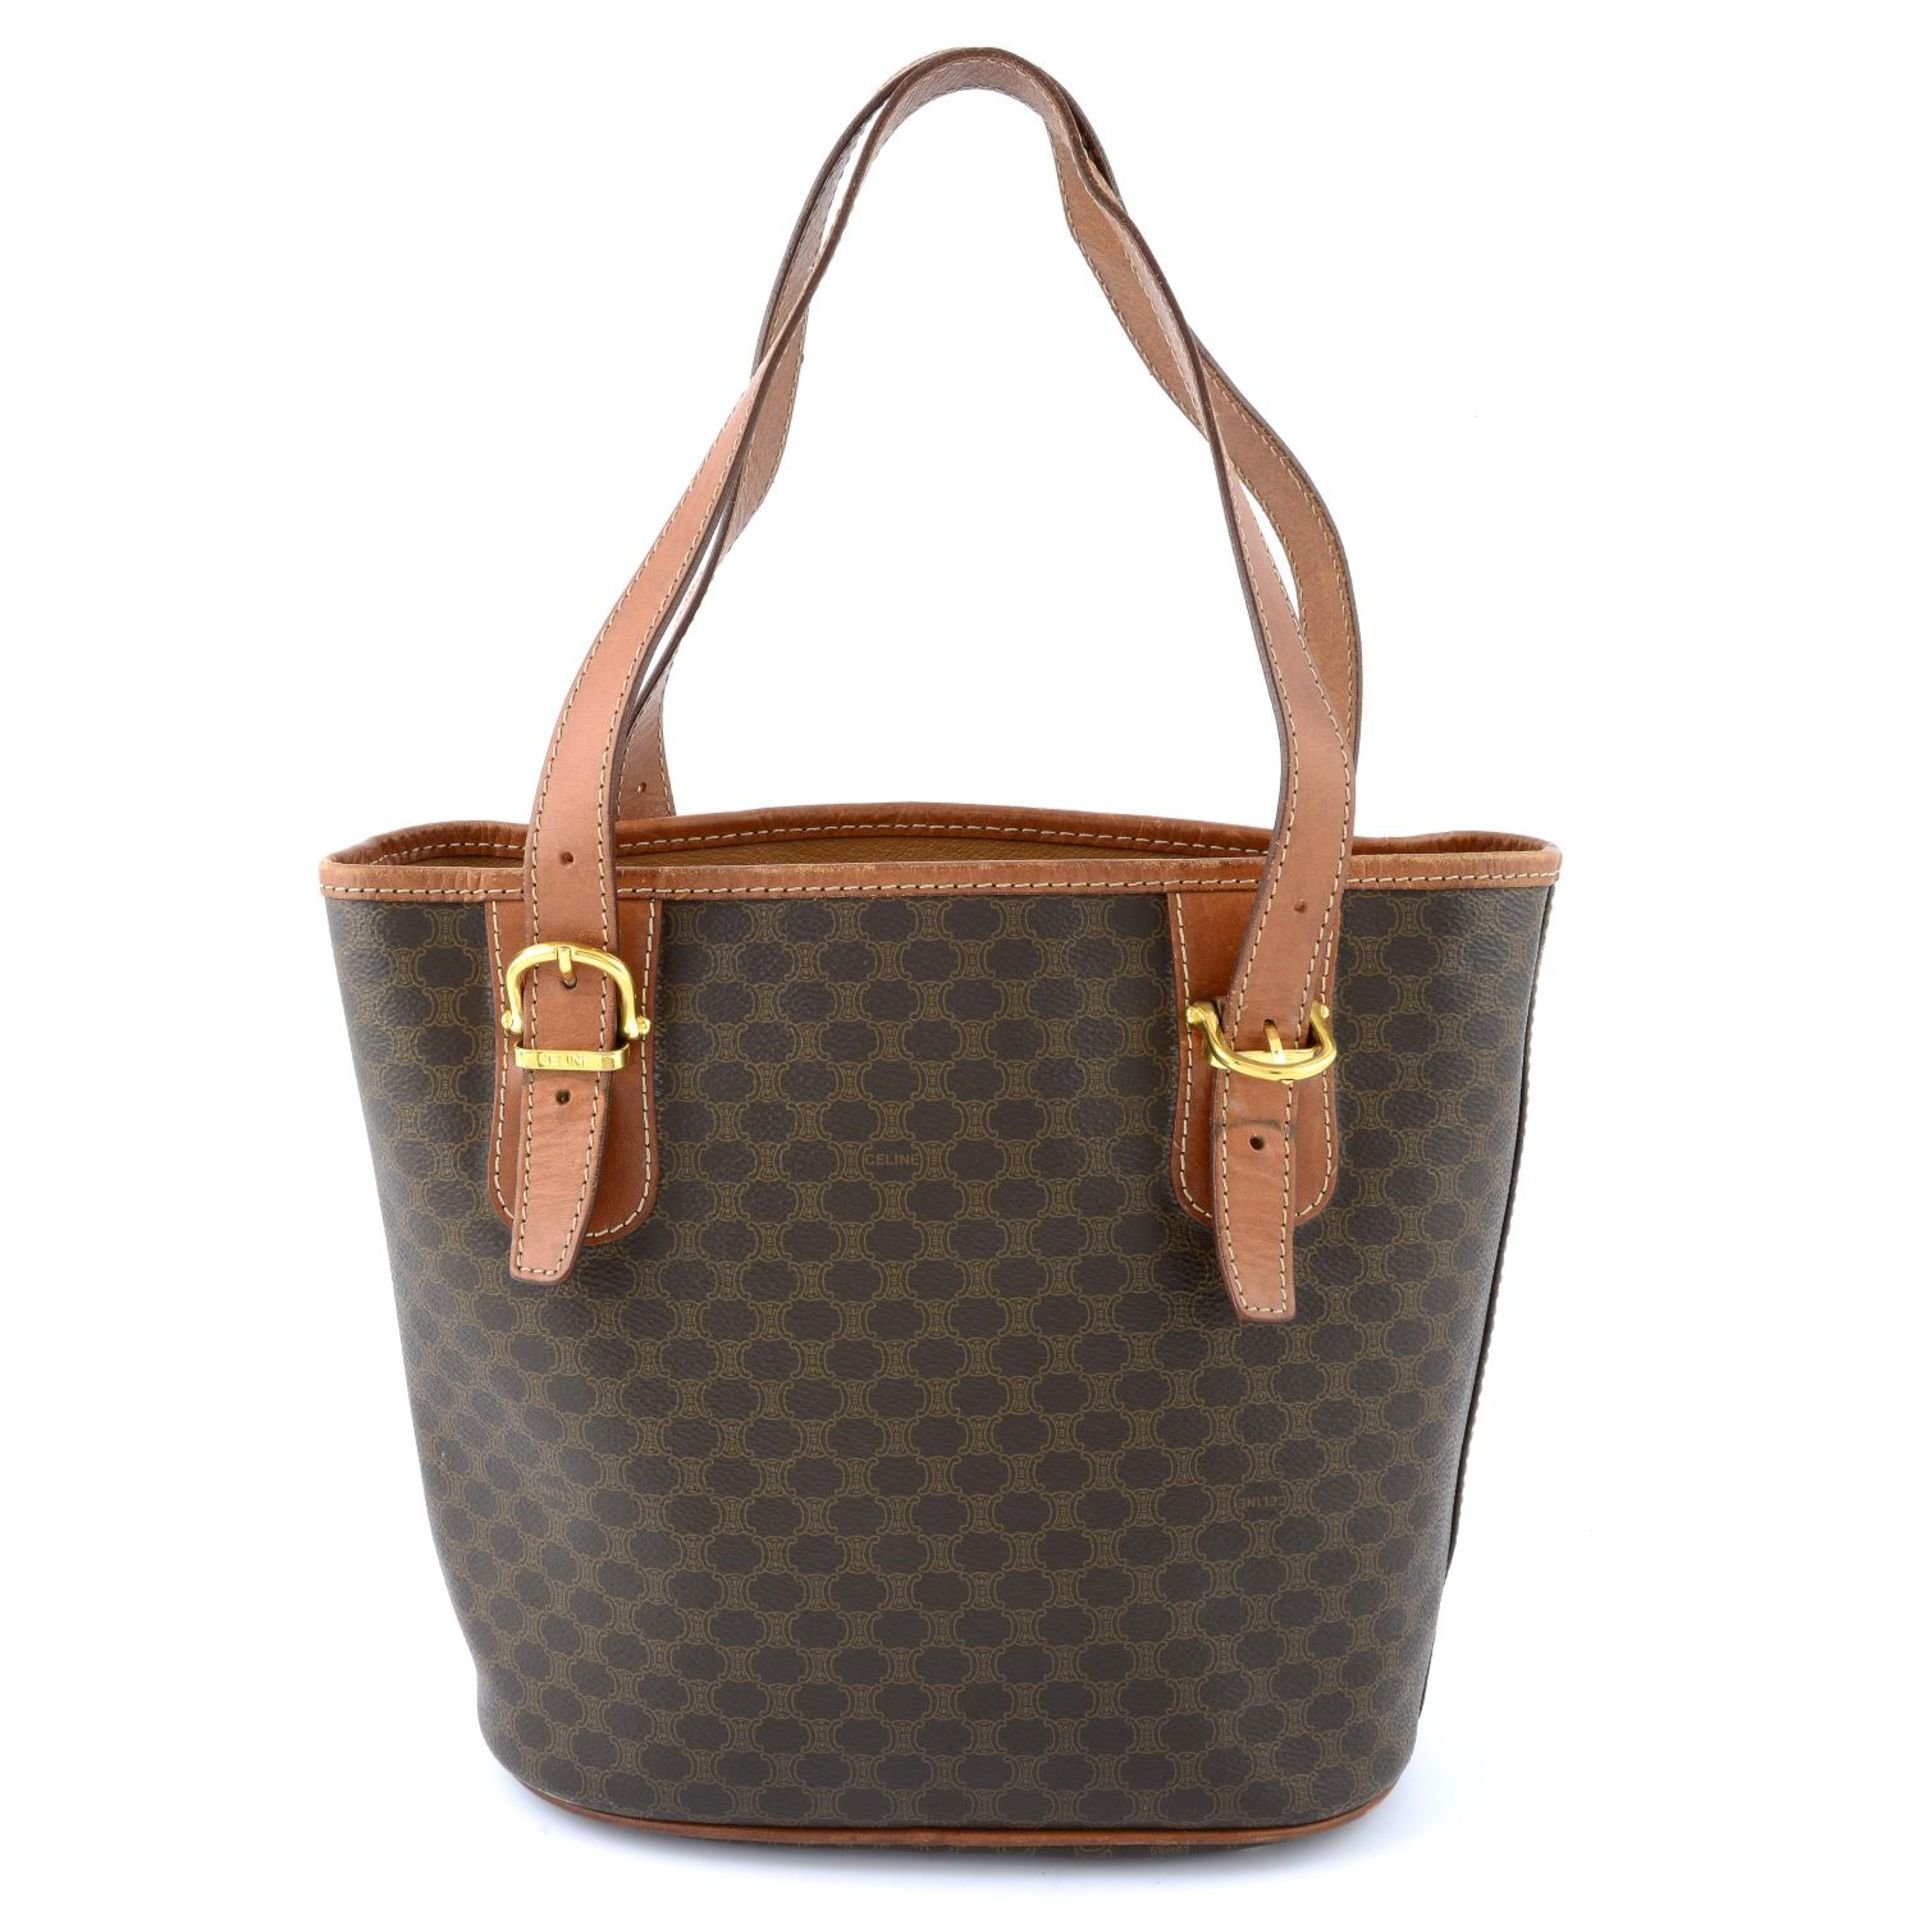 CÉLINE - a Macadam coated canvas handbag. - Image 2 of 5